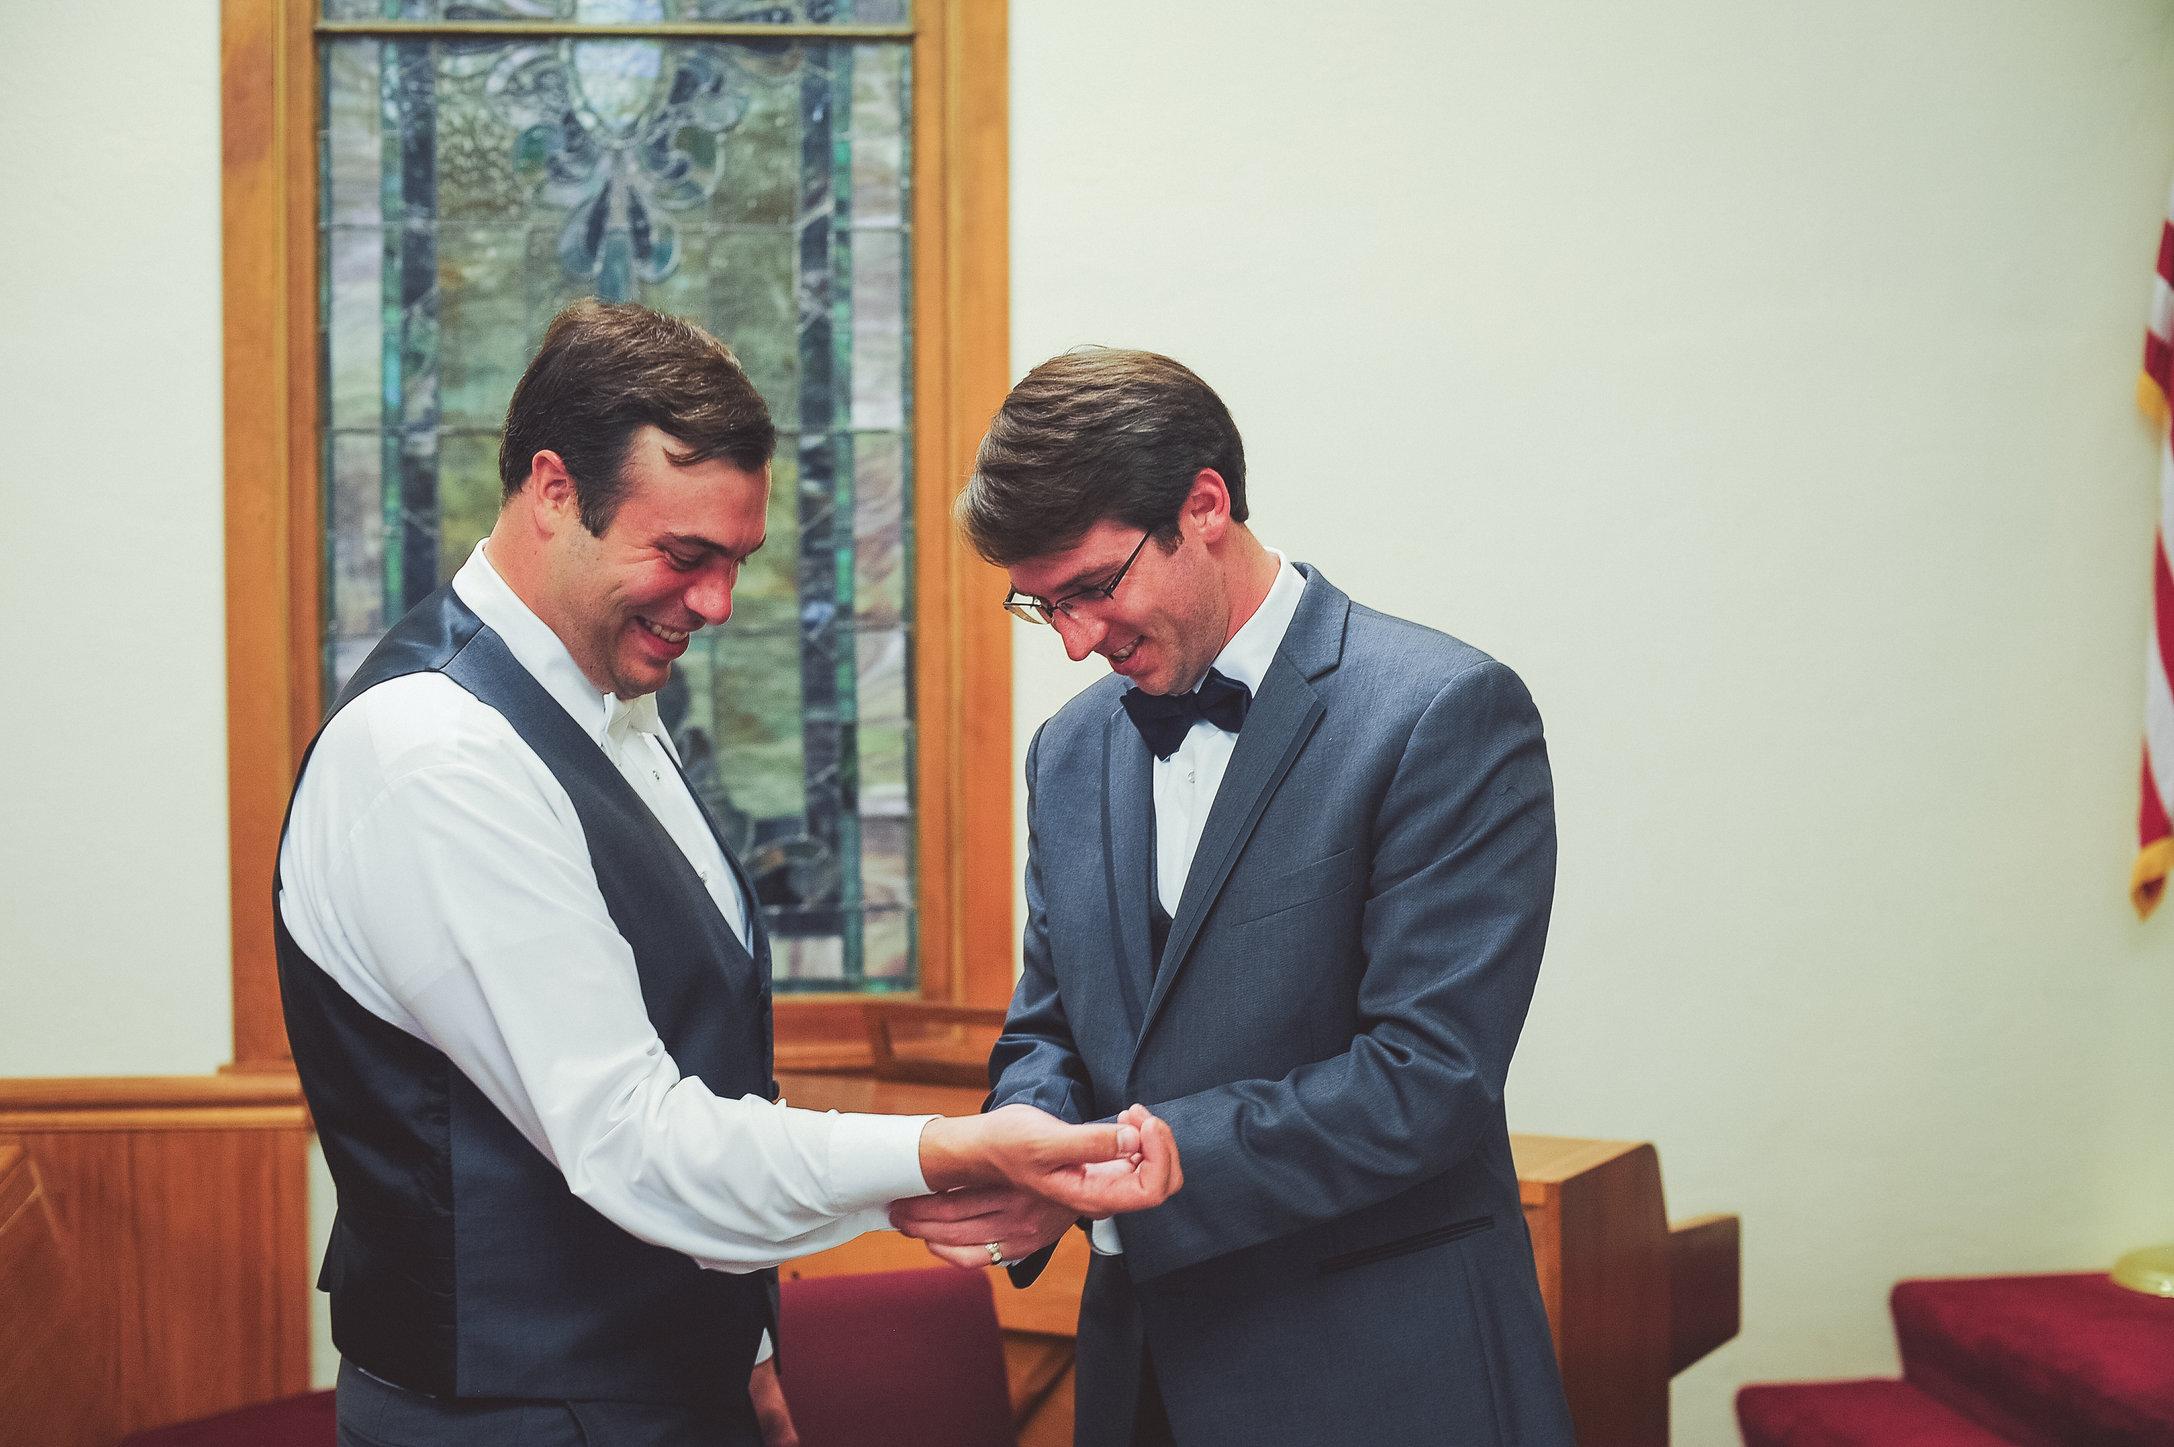 SandC-wedding-77.jpg